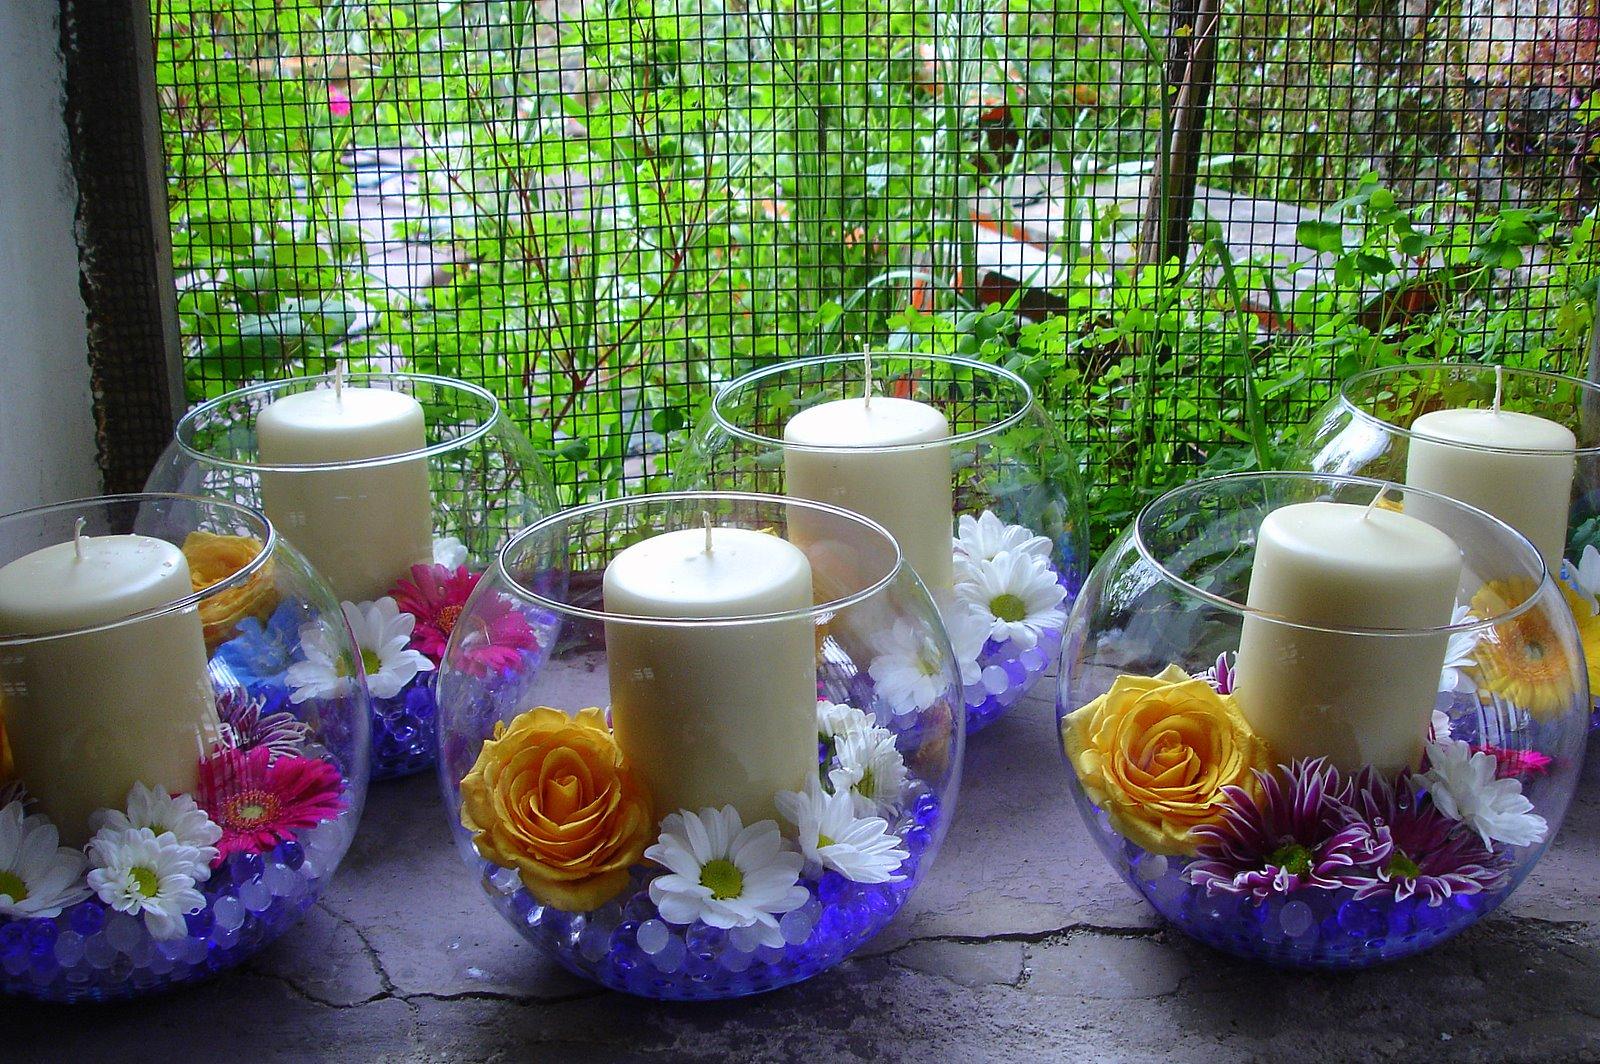 Bodas la plaza cangas del narcea asturias centros de flores centros mesa restaurante - Precios de centros de mesa para boda ...